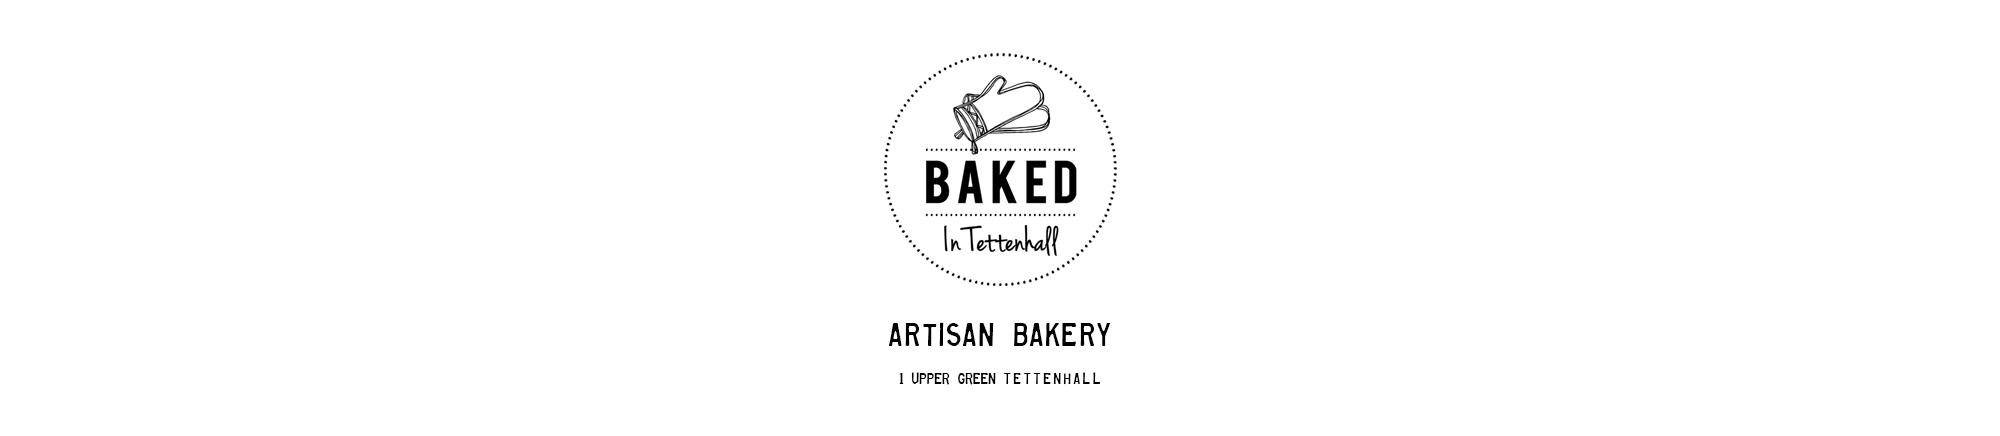 Baked header